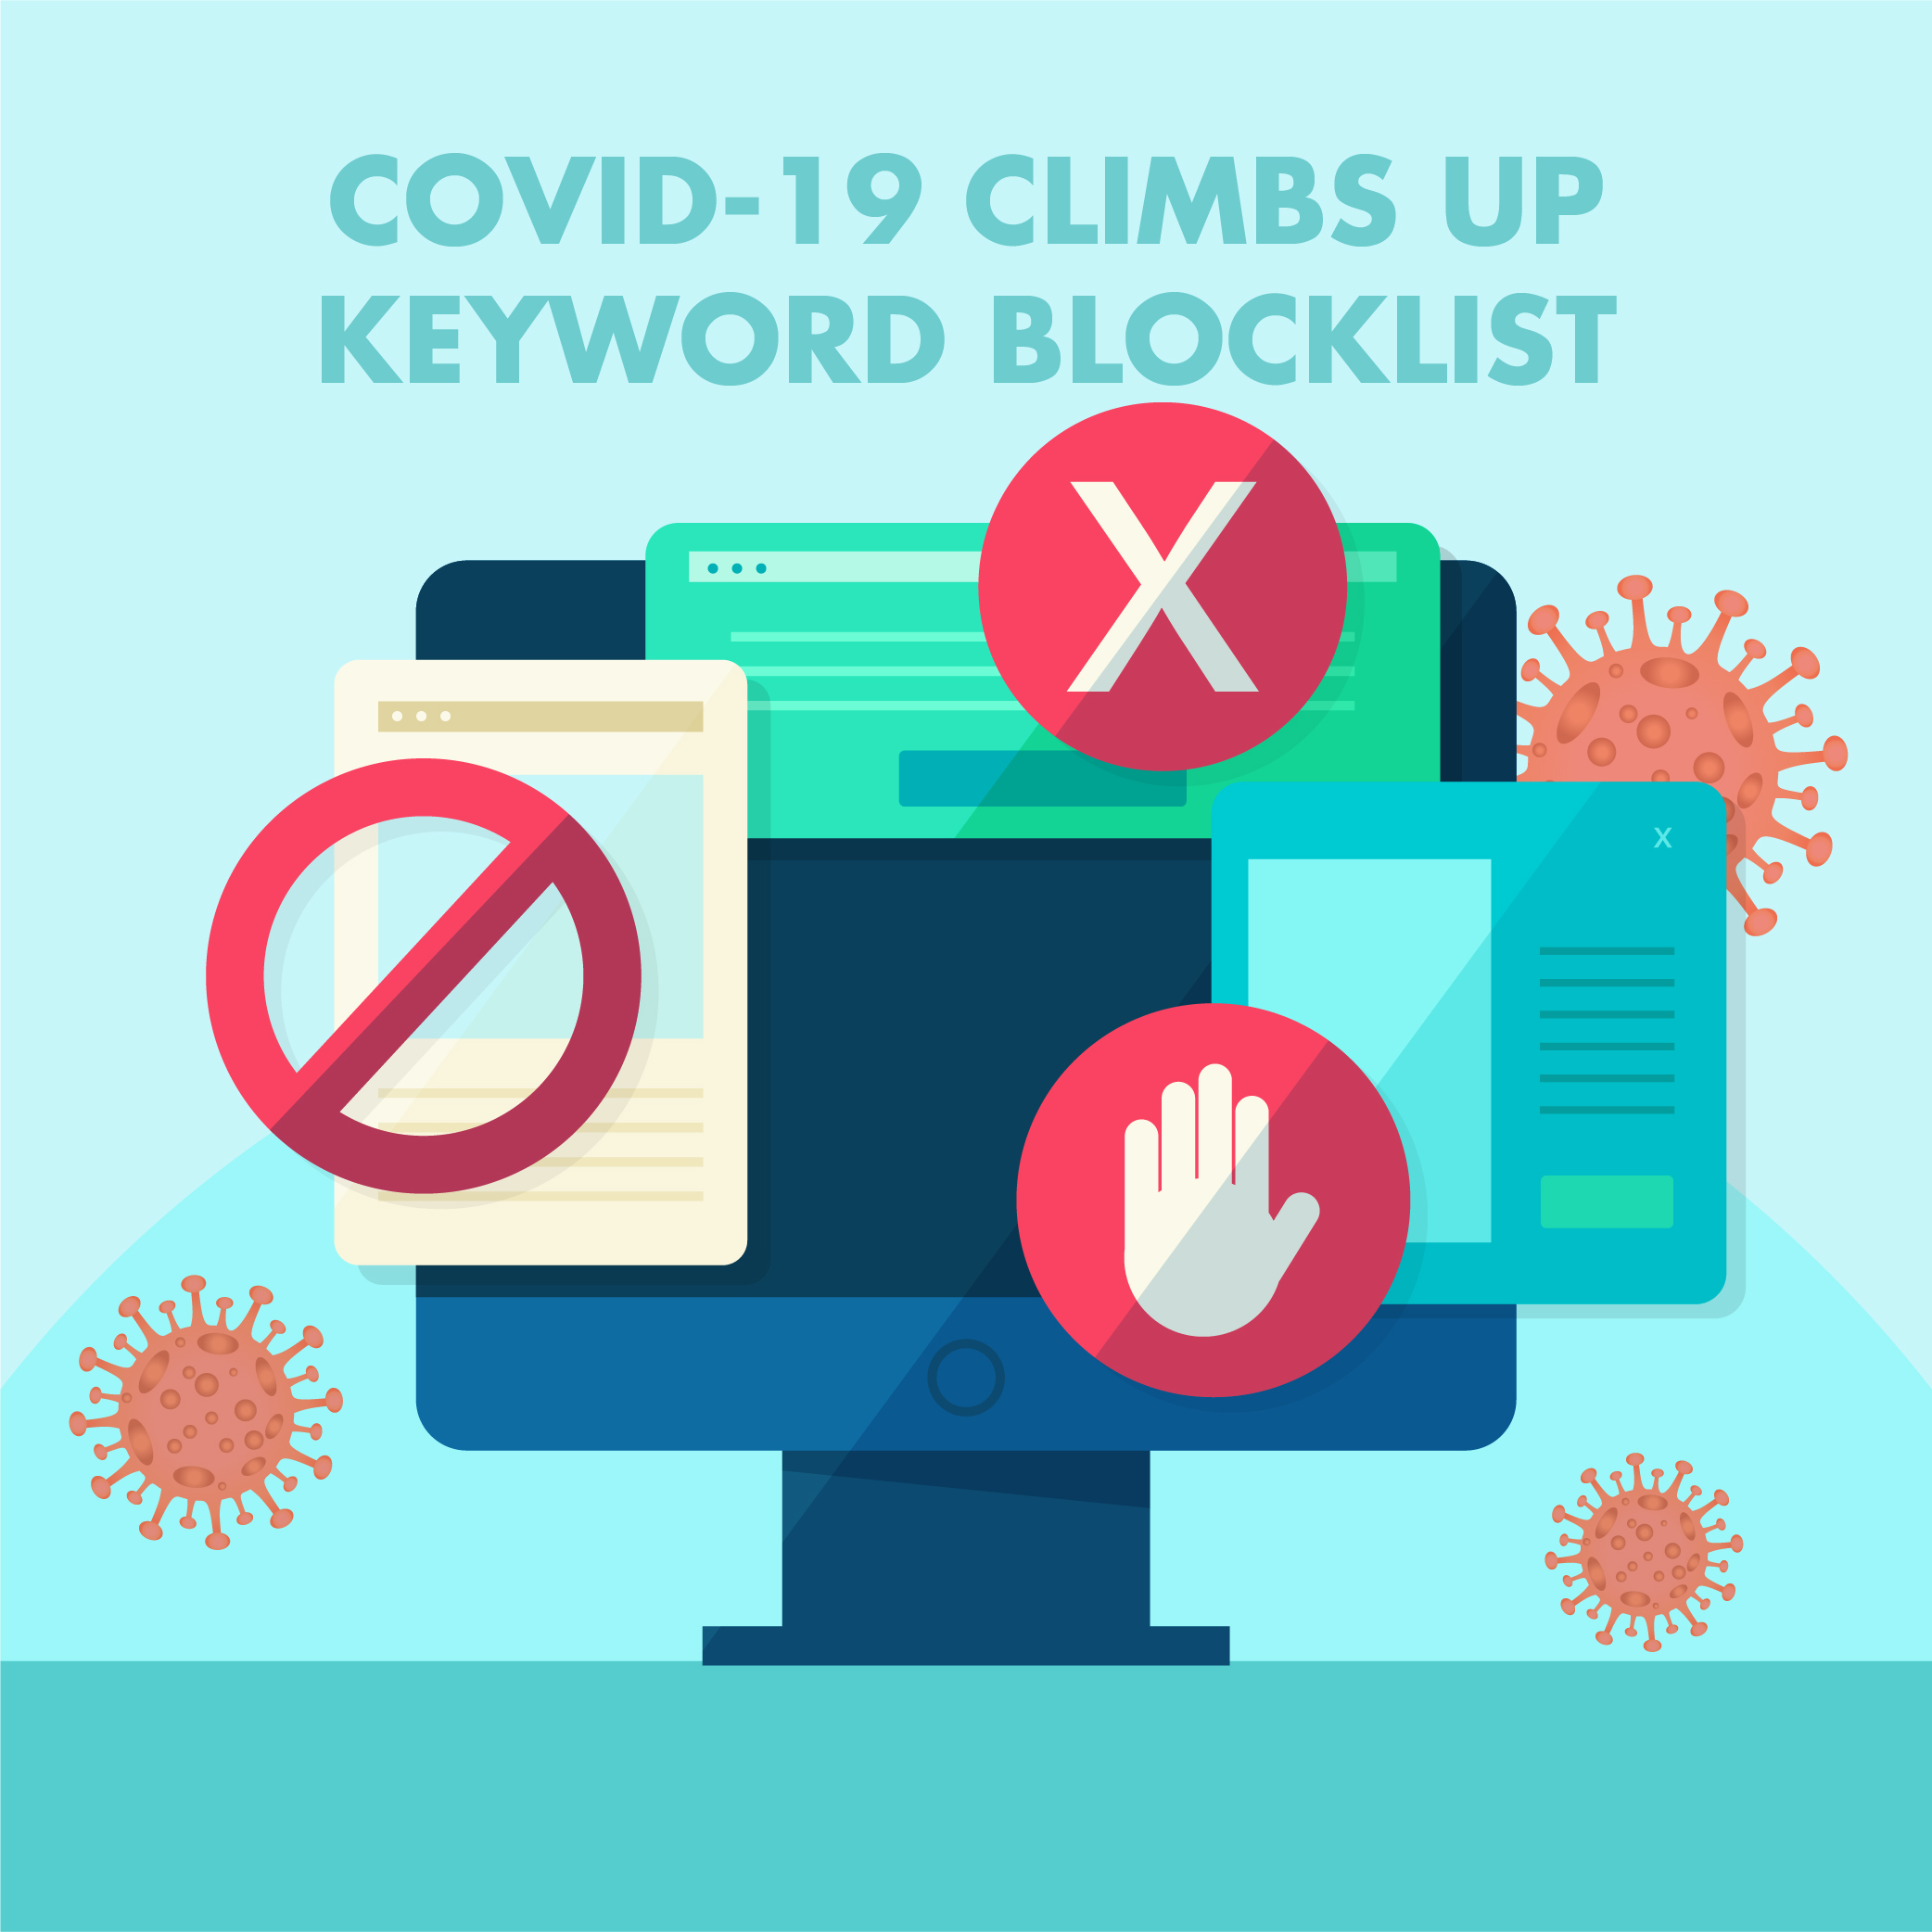 COVID-19 CLIMBS UP KEYWORD BLOCKLIST